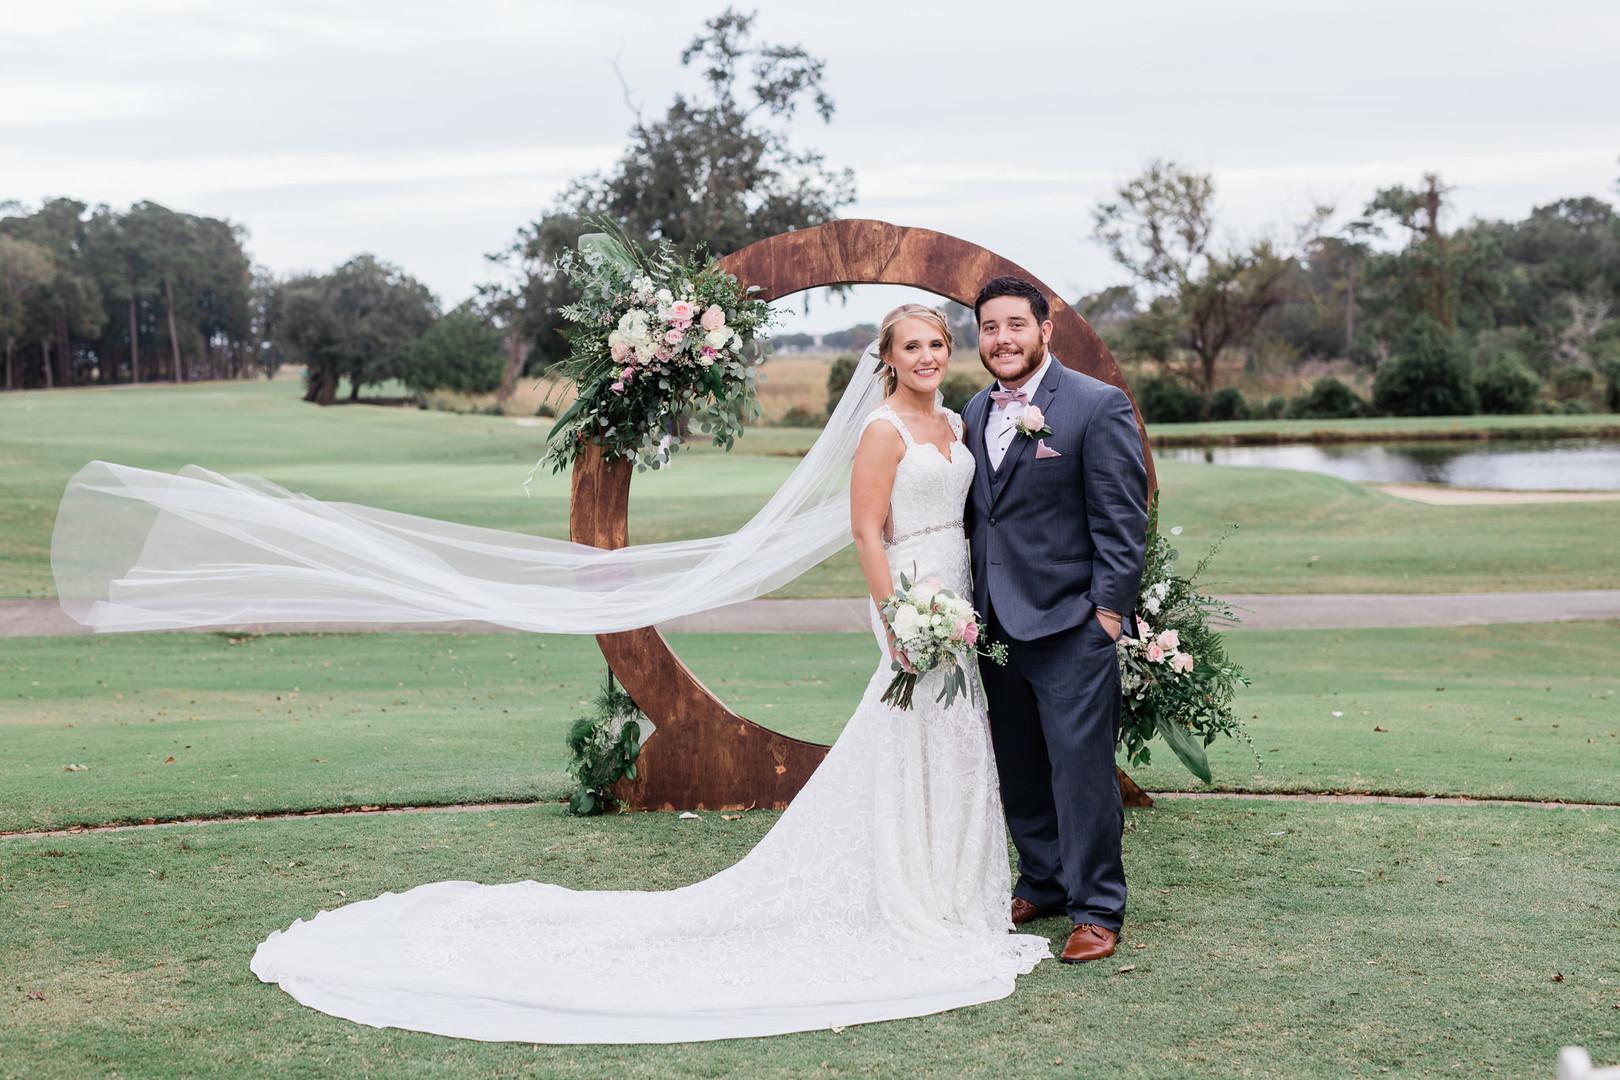 pawleys-plantation-wedding-1.jpg